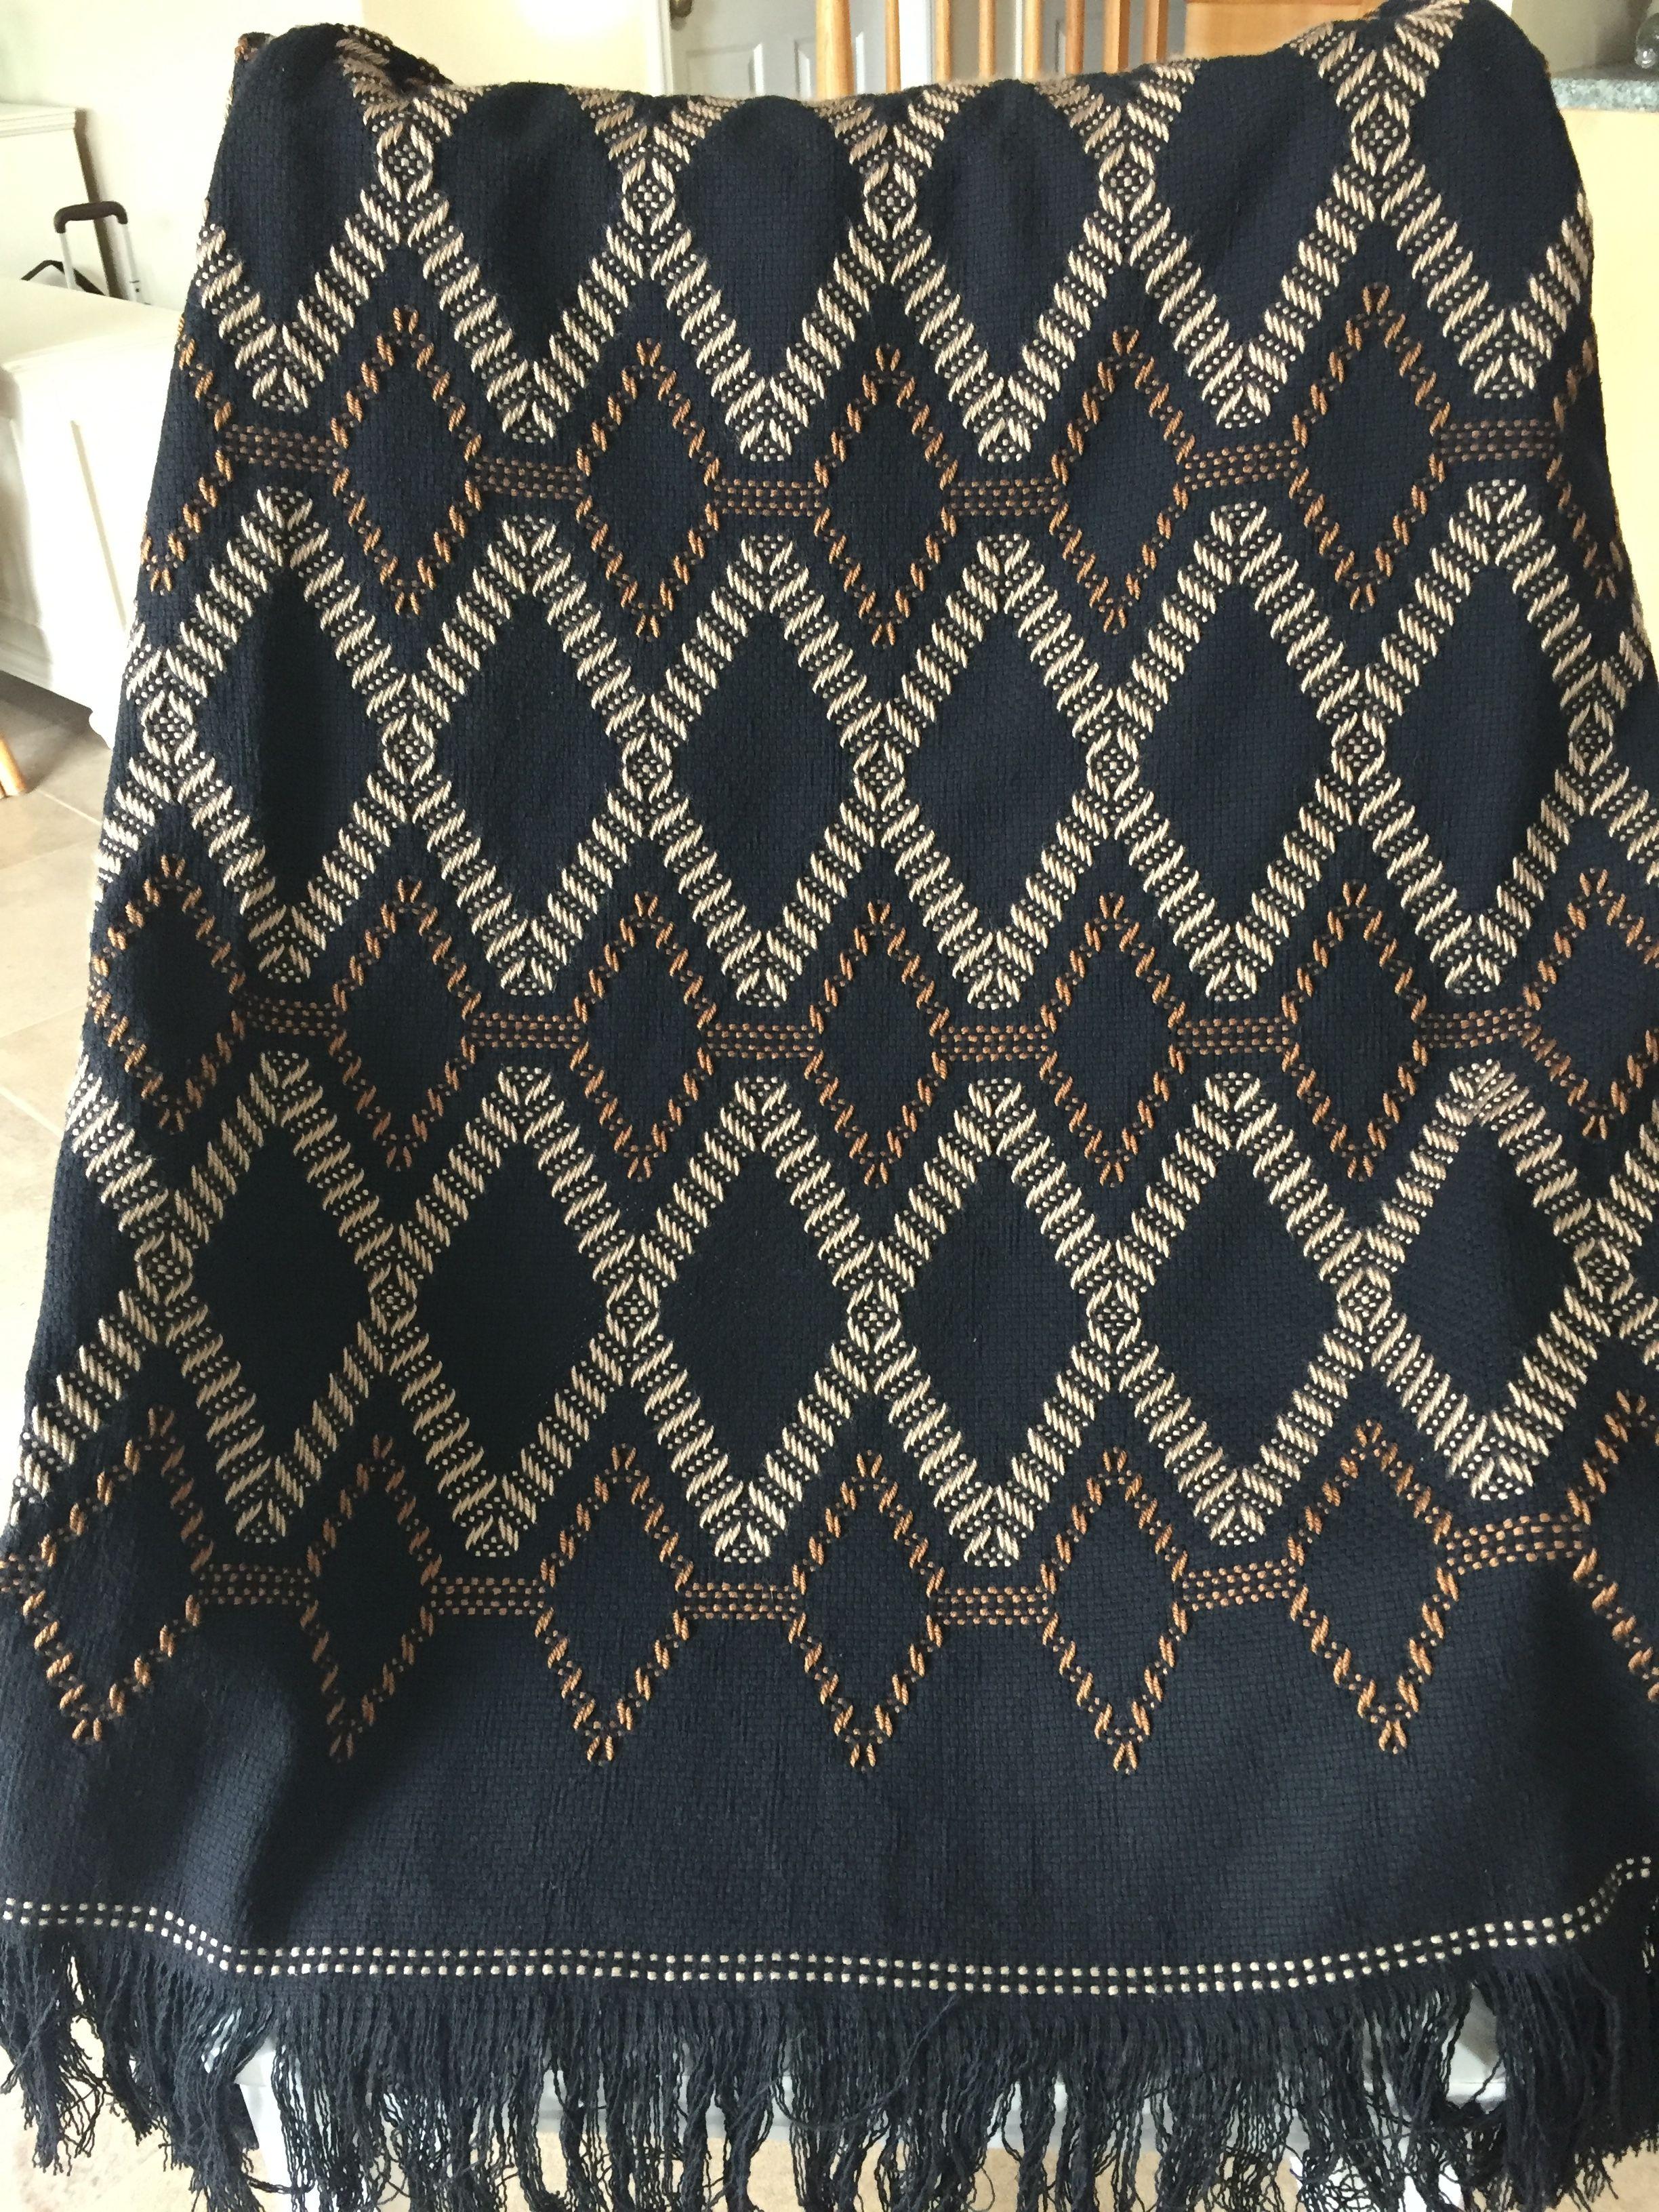 Blue Bayou pattern More